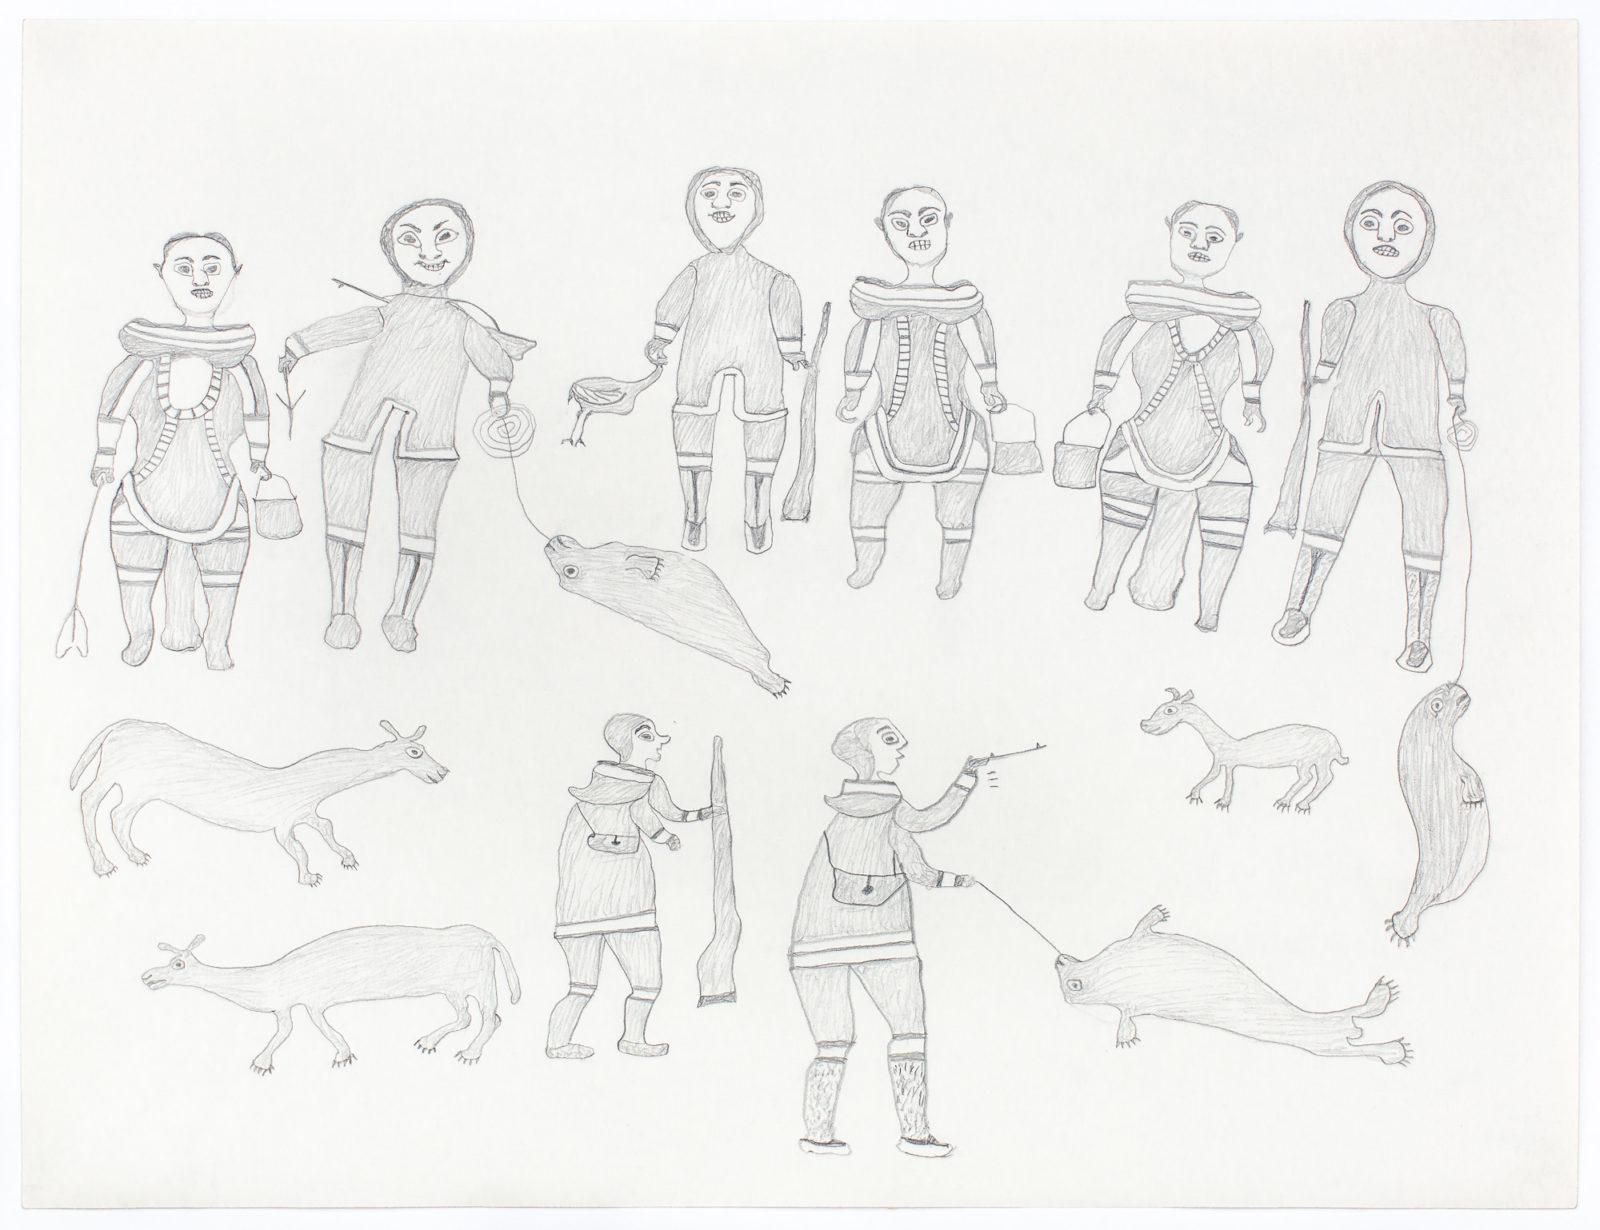 Kiakshuk - untitled (seal hunting)